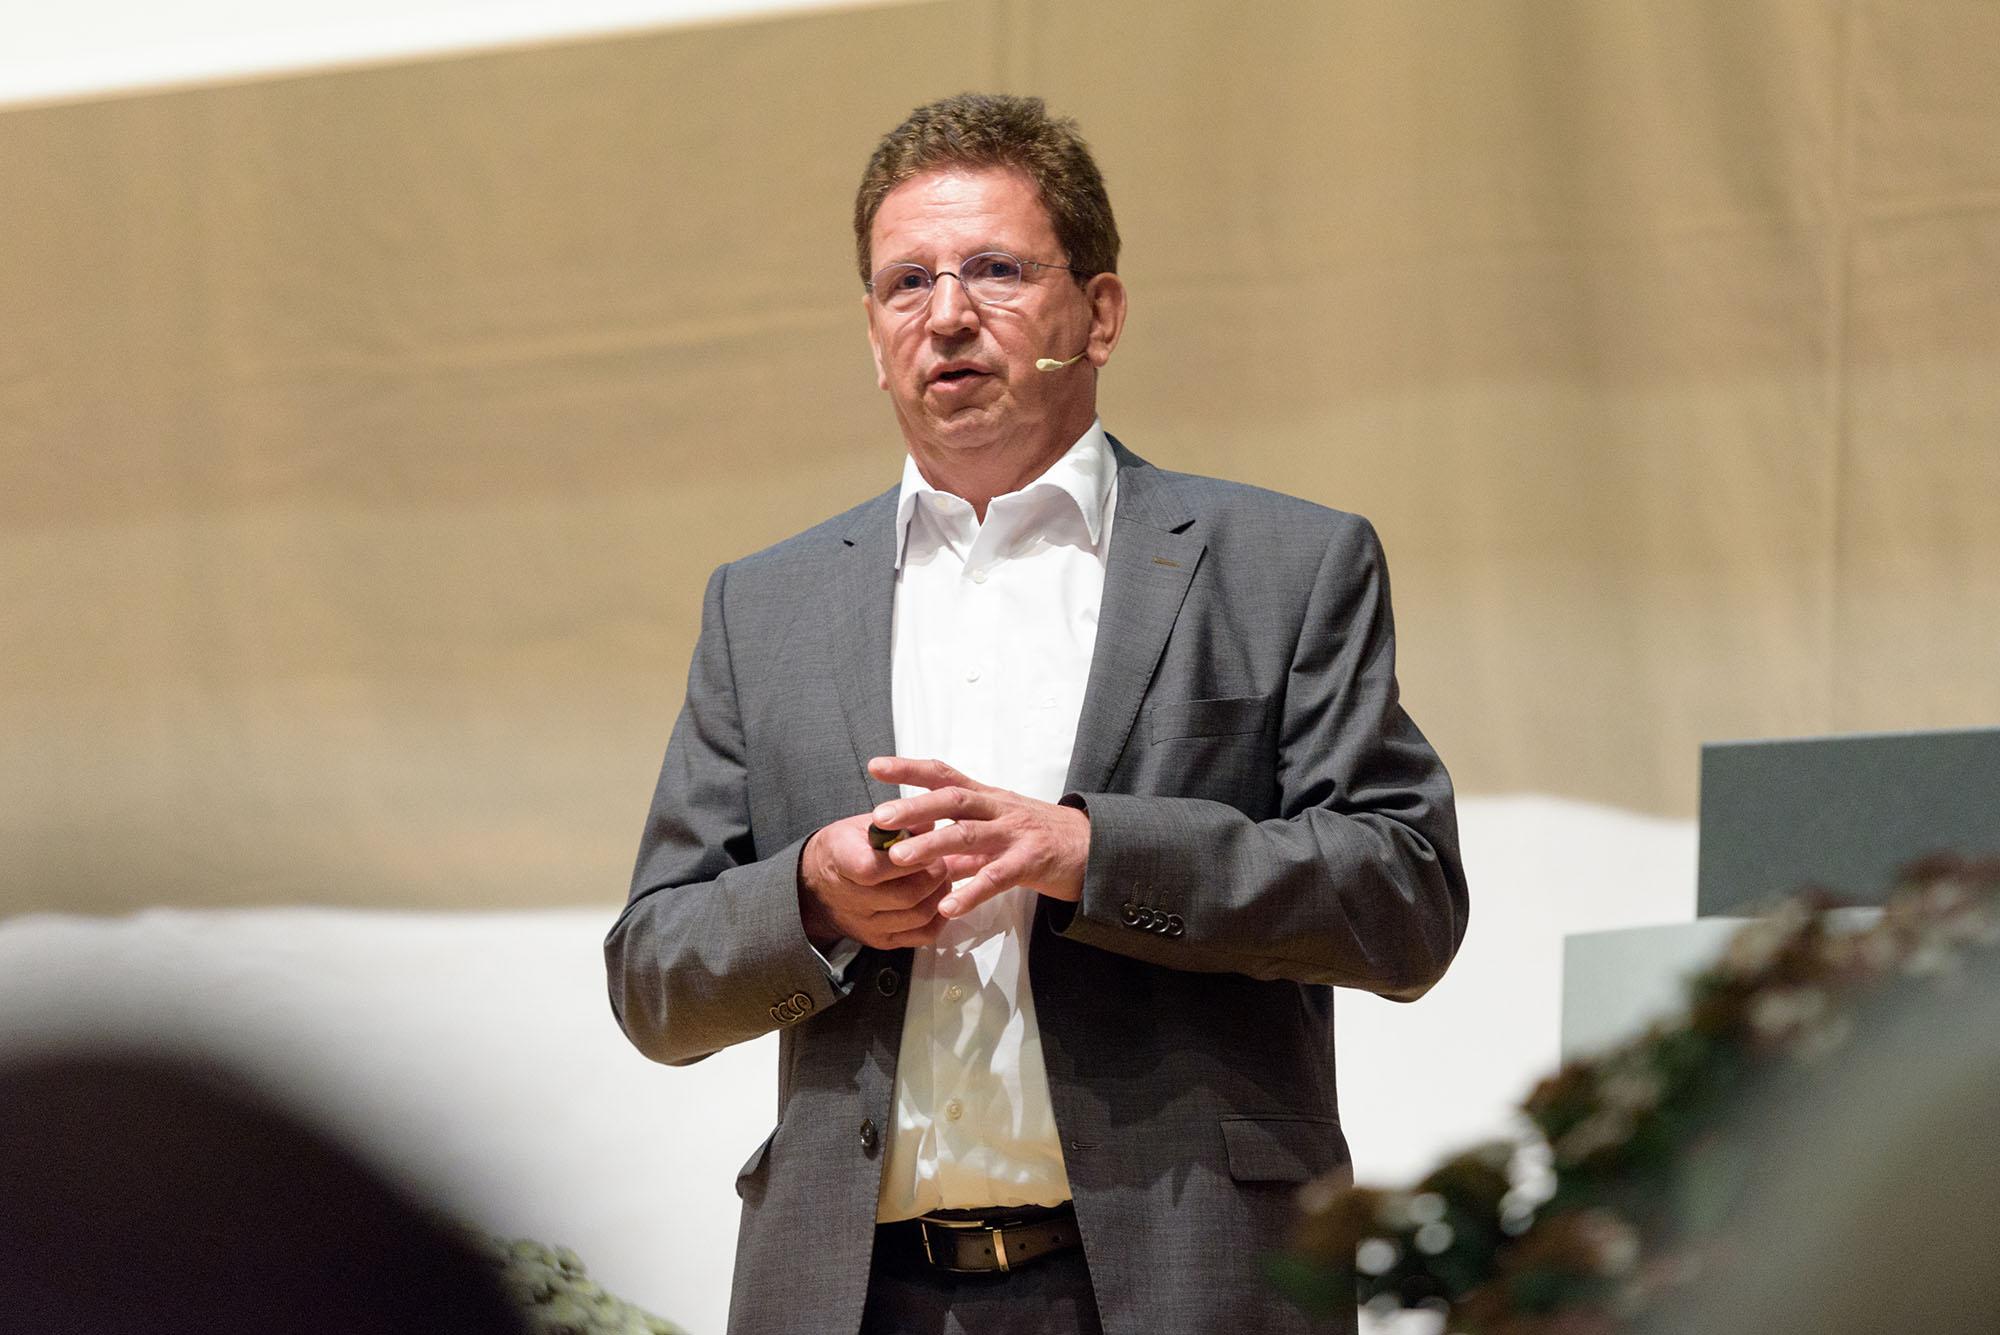 Siegfried Gerlach, CEO Siemens Schweiz AG